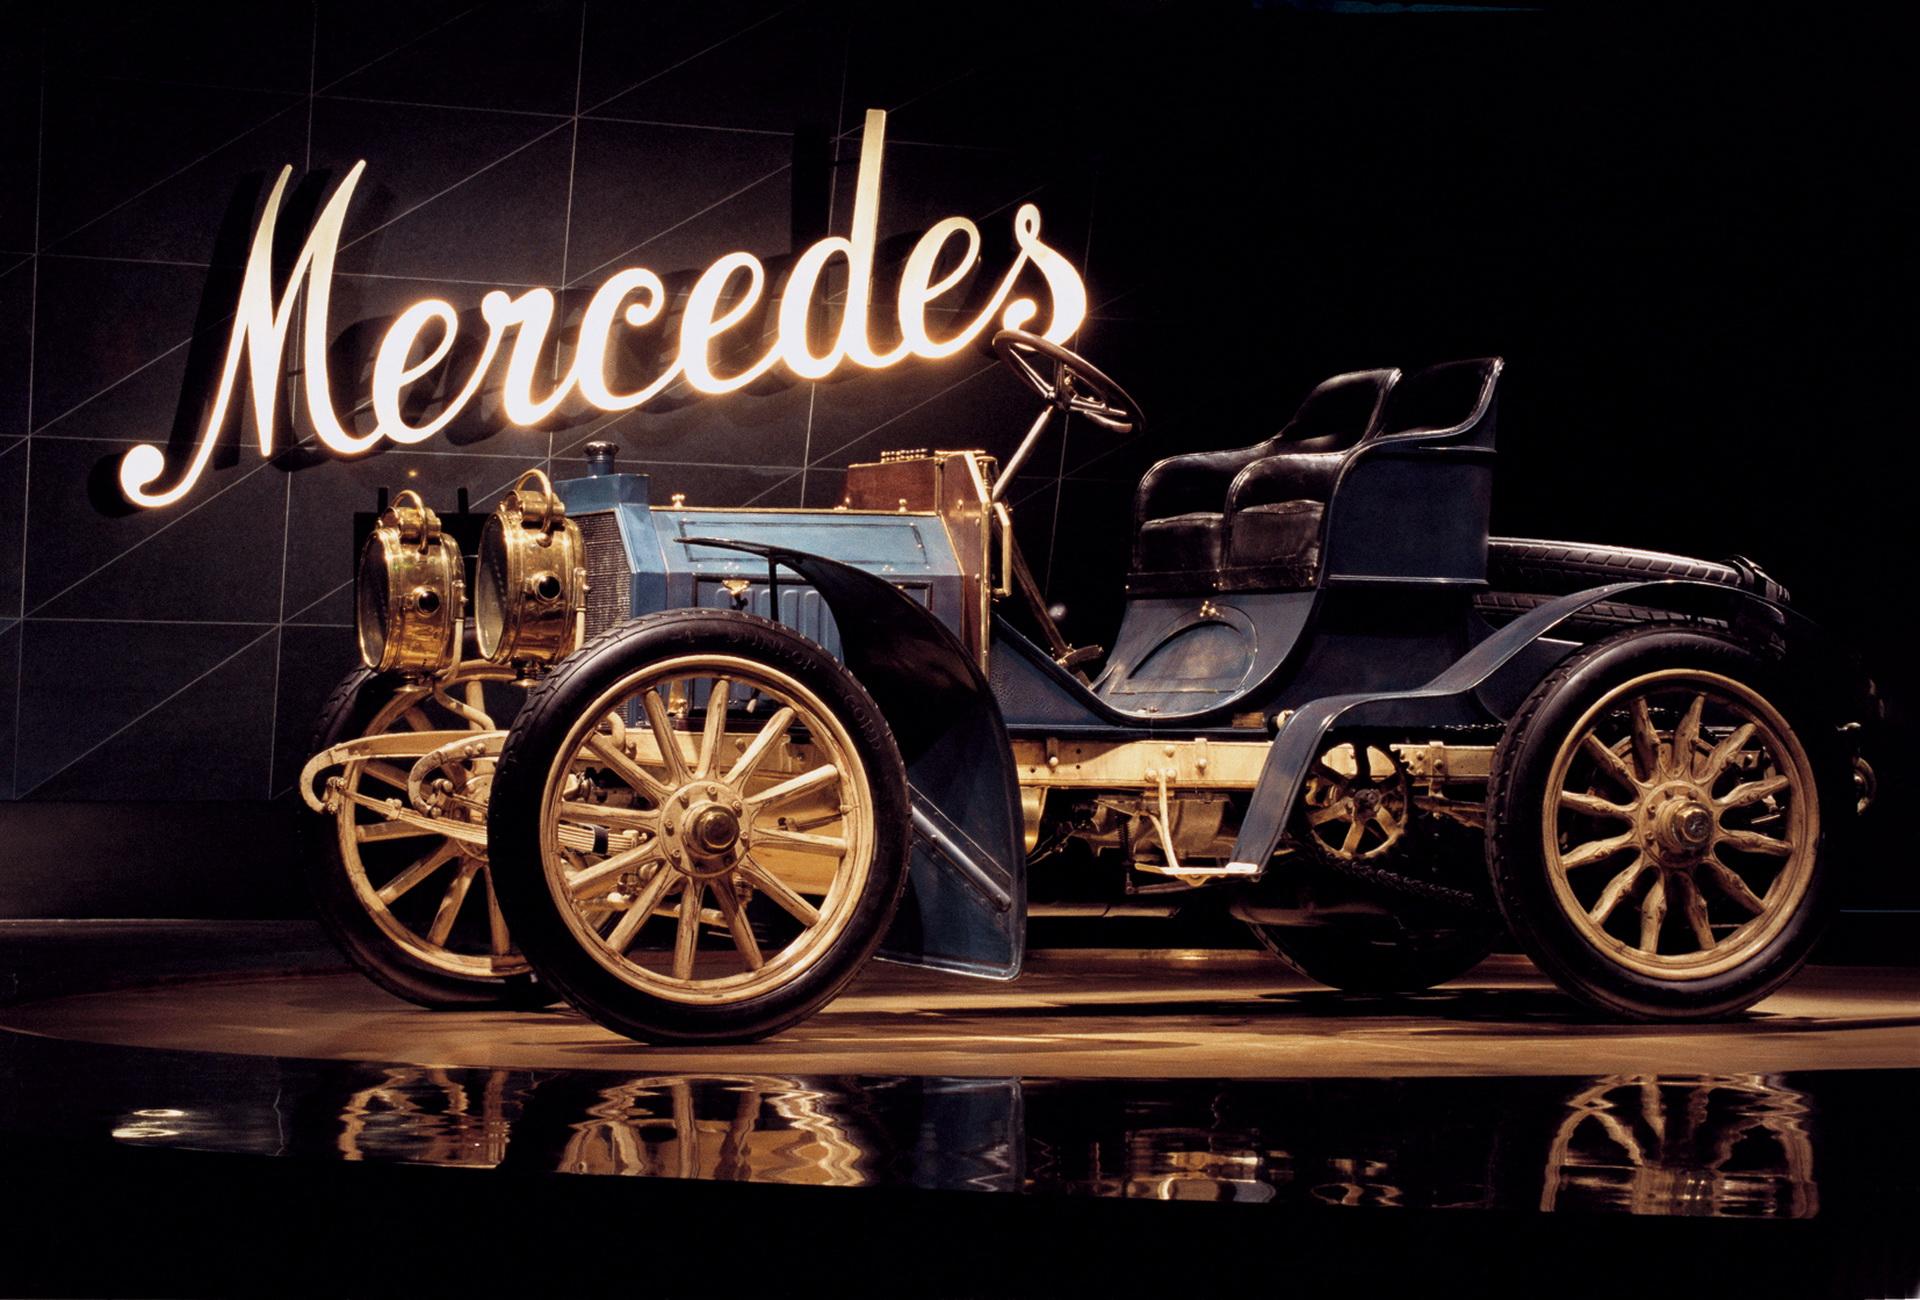 mercedes-brand-120years-09.jpg